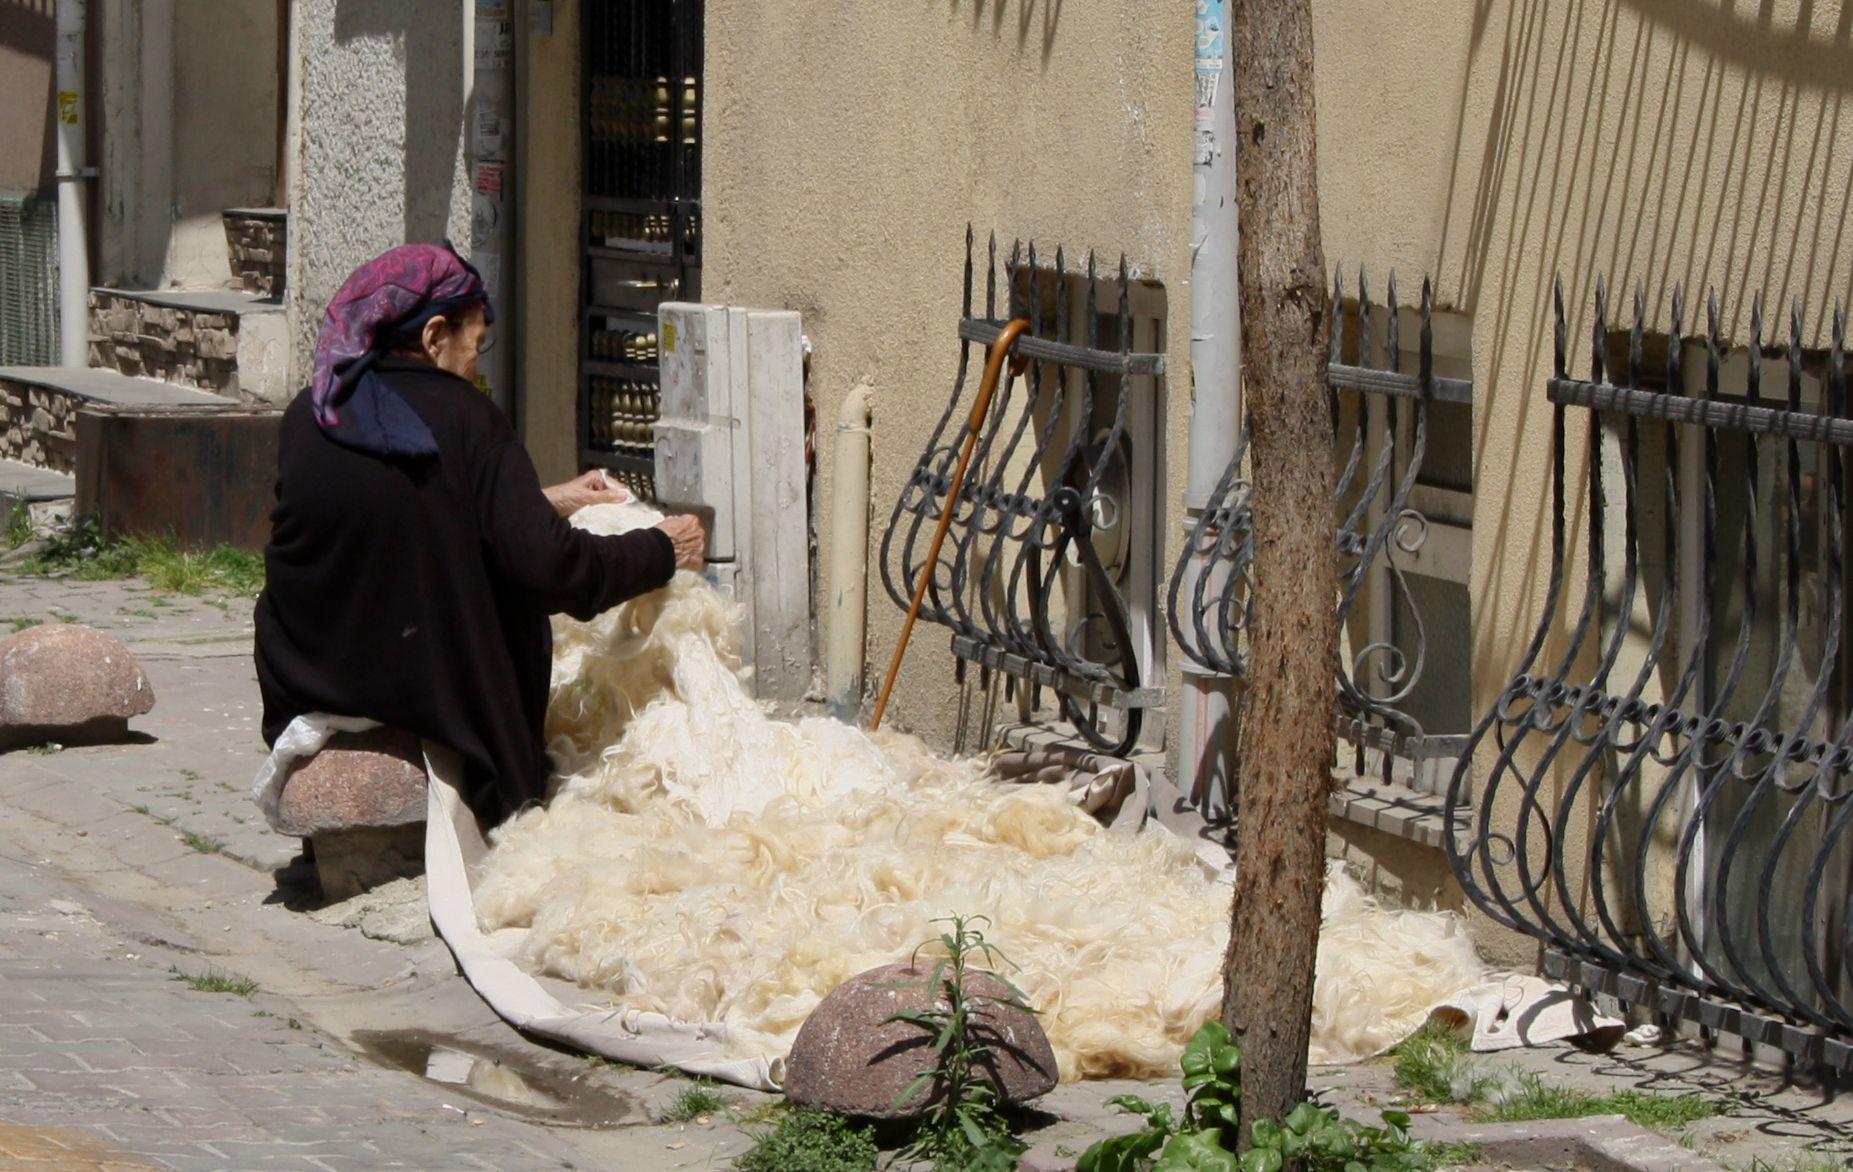 Woman preparing freshly shaven sheeps wool in downtown Istanbul